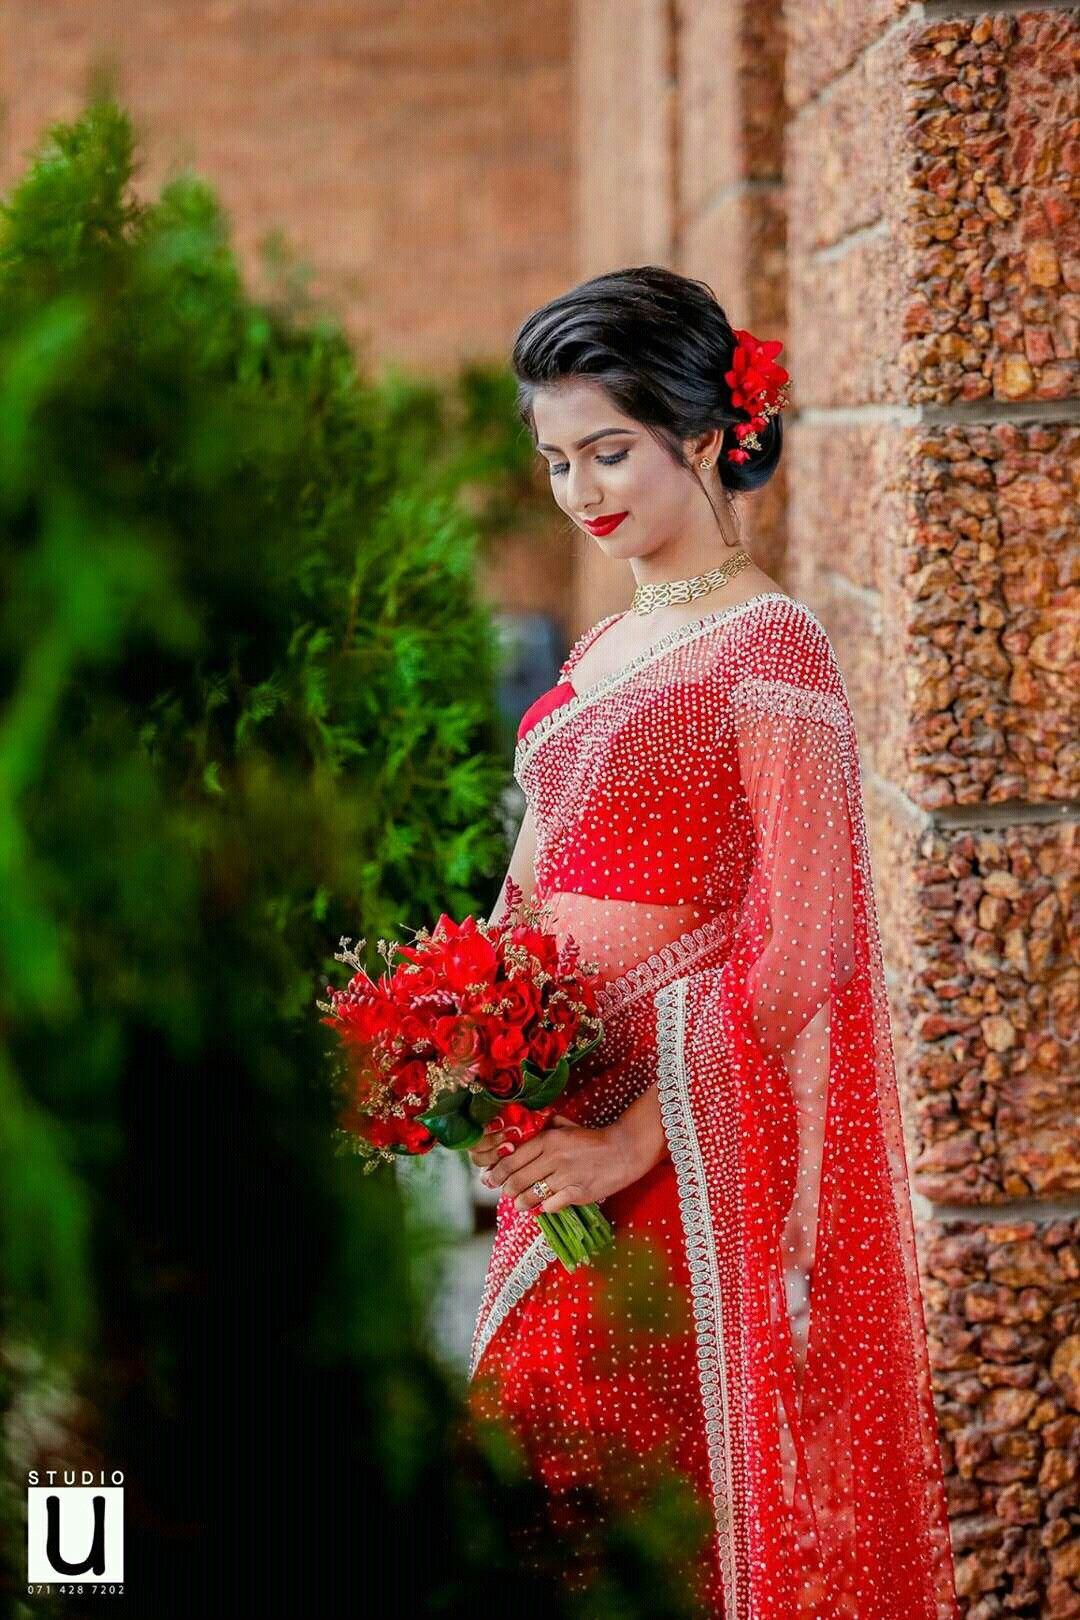 Dressed By Dhananjaya Bandara BridesWedding DressesBoardWeddings HomecomingBridal